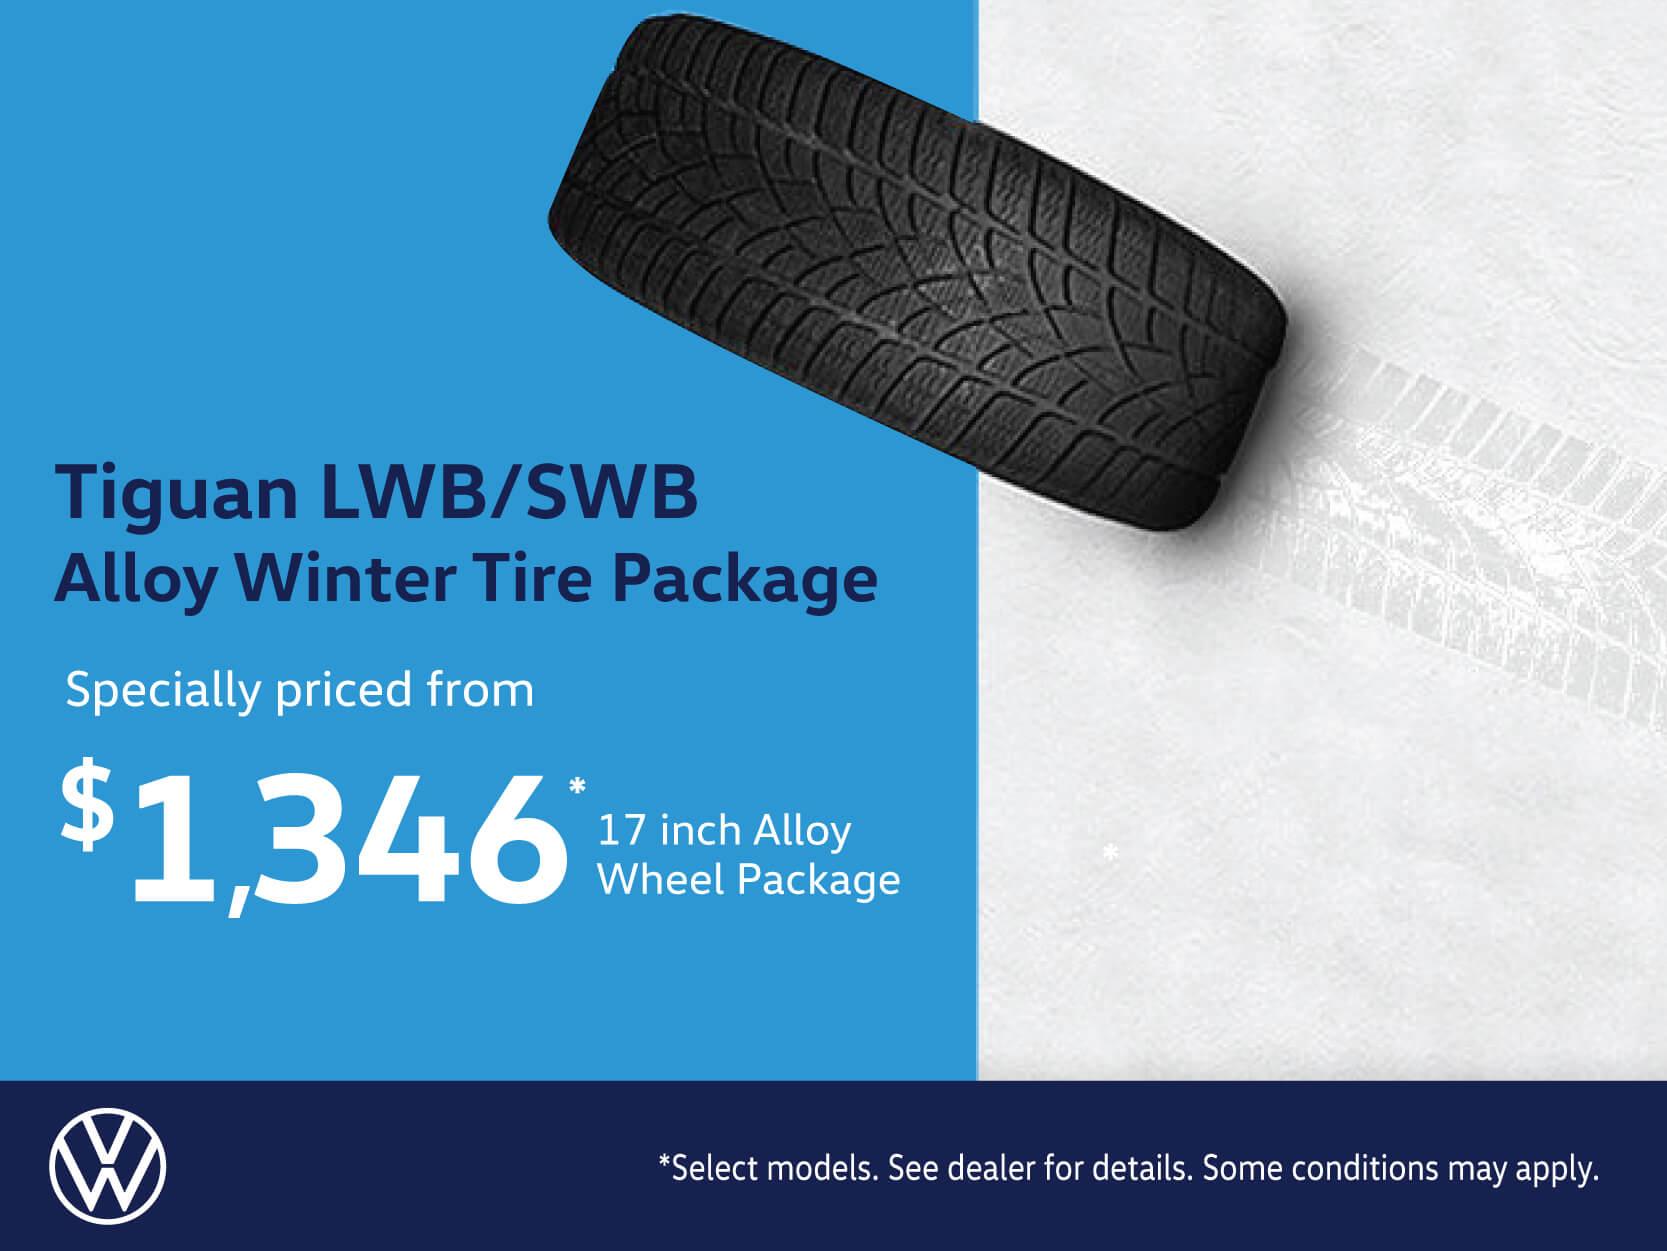 Tiguan LWB-SWB Alloy Winter Tire Package